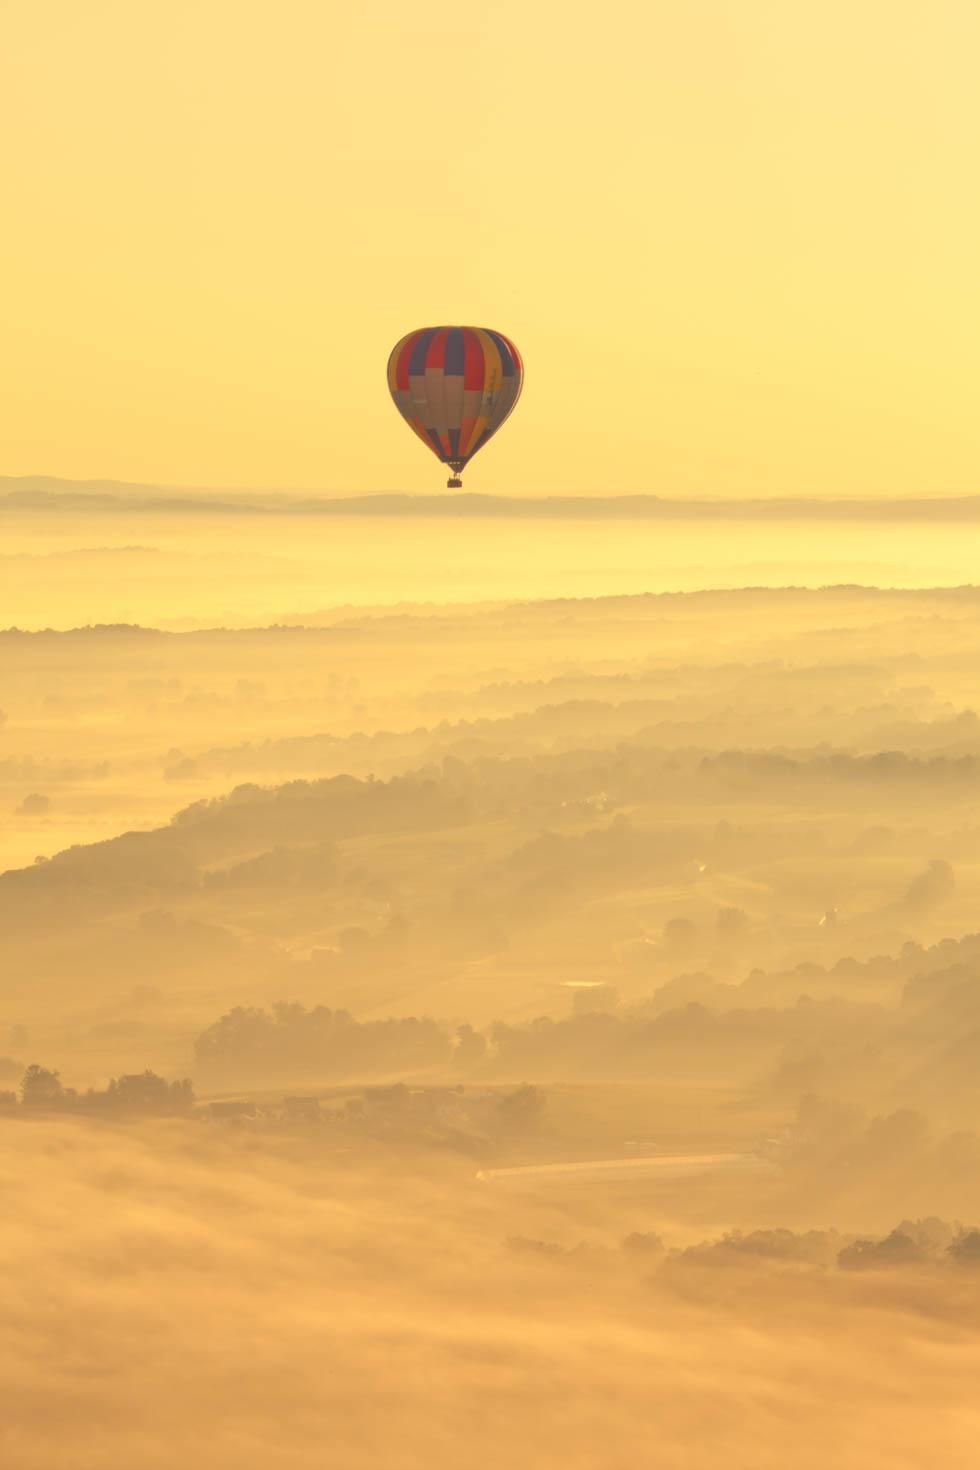 Hot Air Balloon Ride, Bird-in-Hand, PA #vezzaniphotography